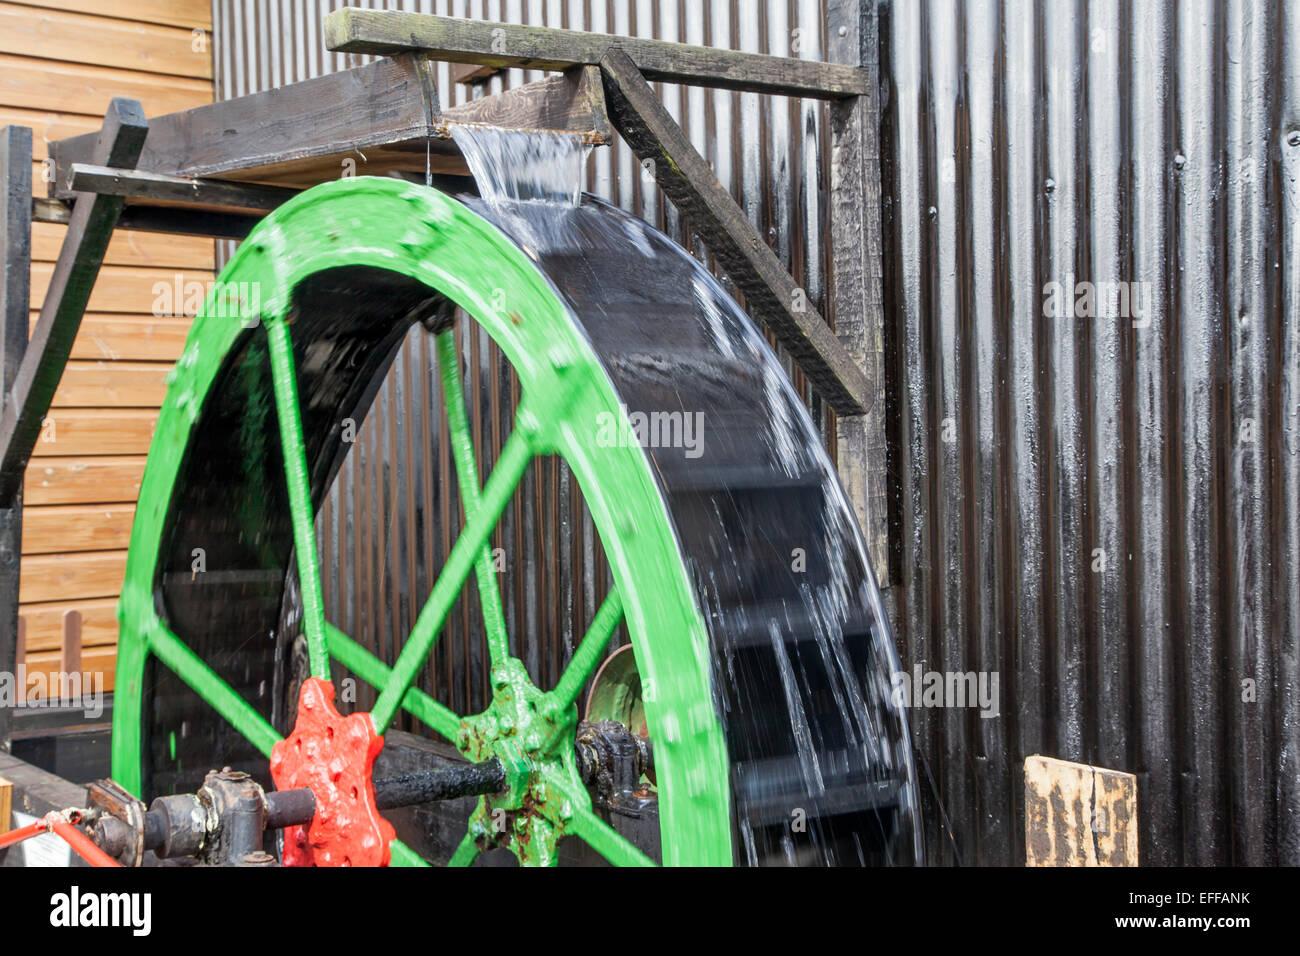 Water wheel - Stock Image